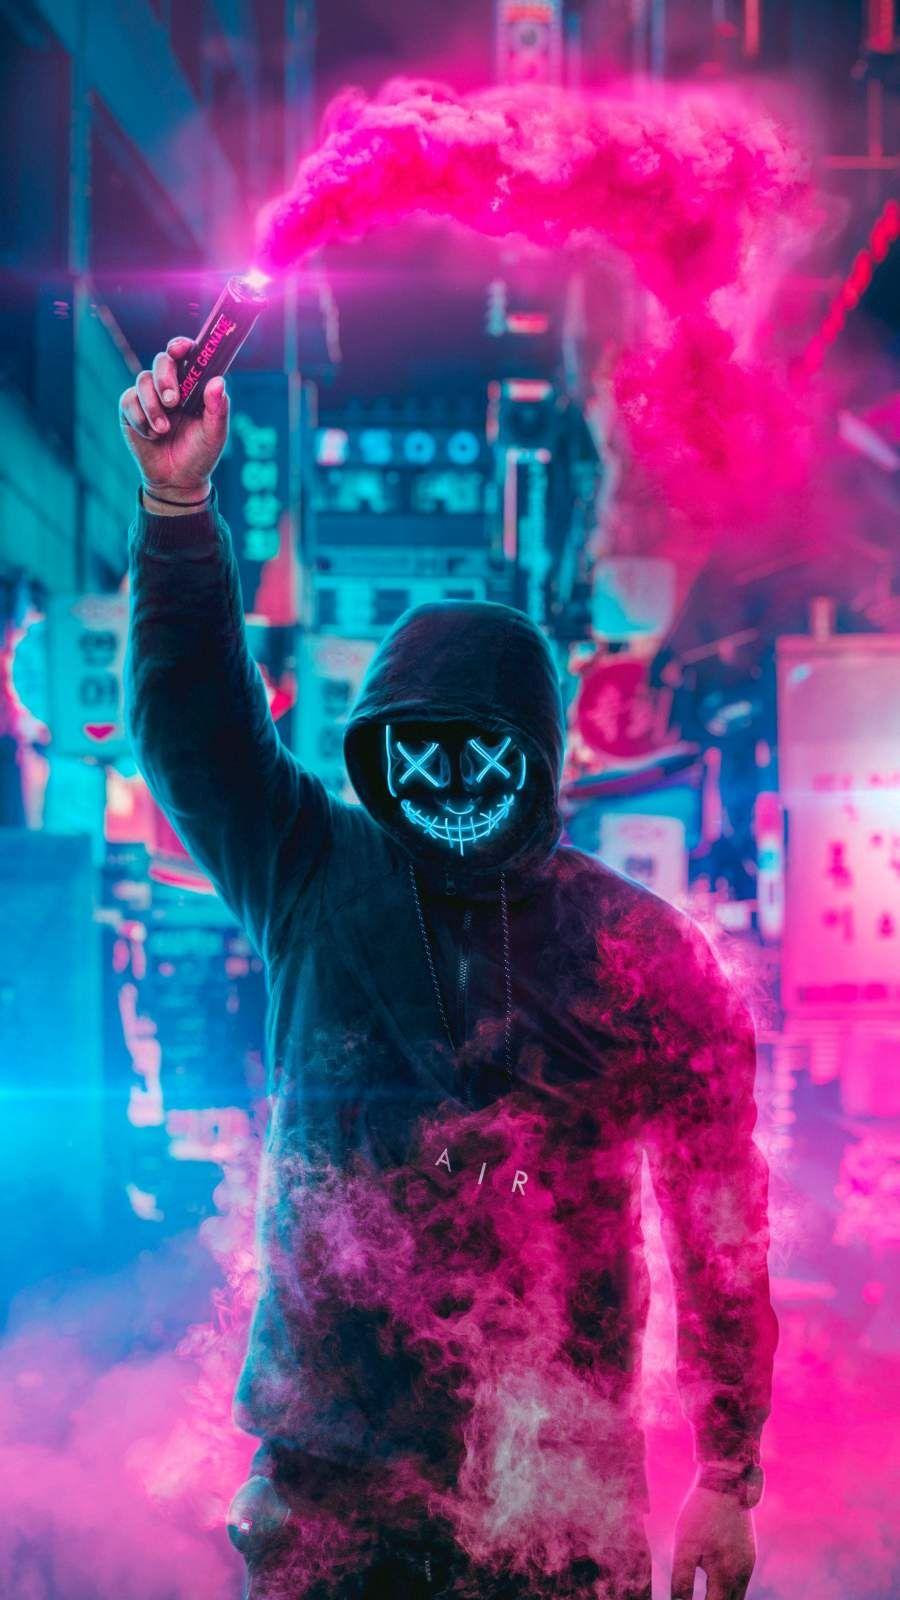 Smoke Grenade Neon Mask Guy iPhone Wallpaper - iPhone Wallpapers